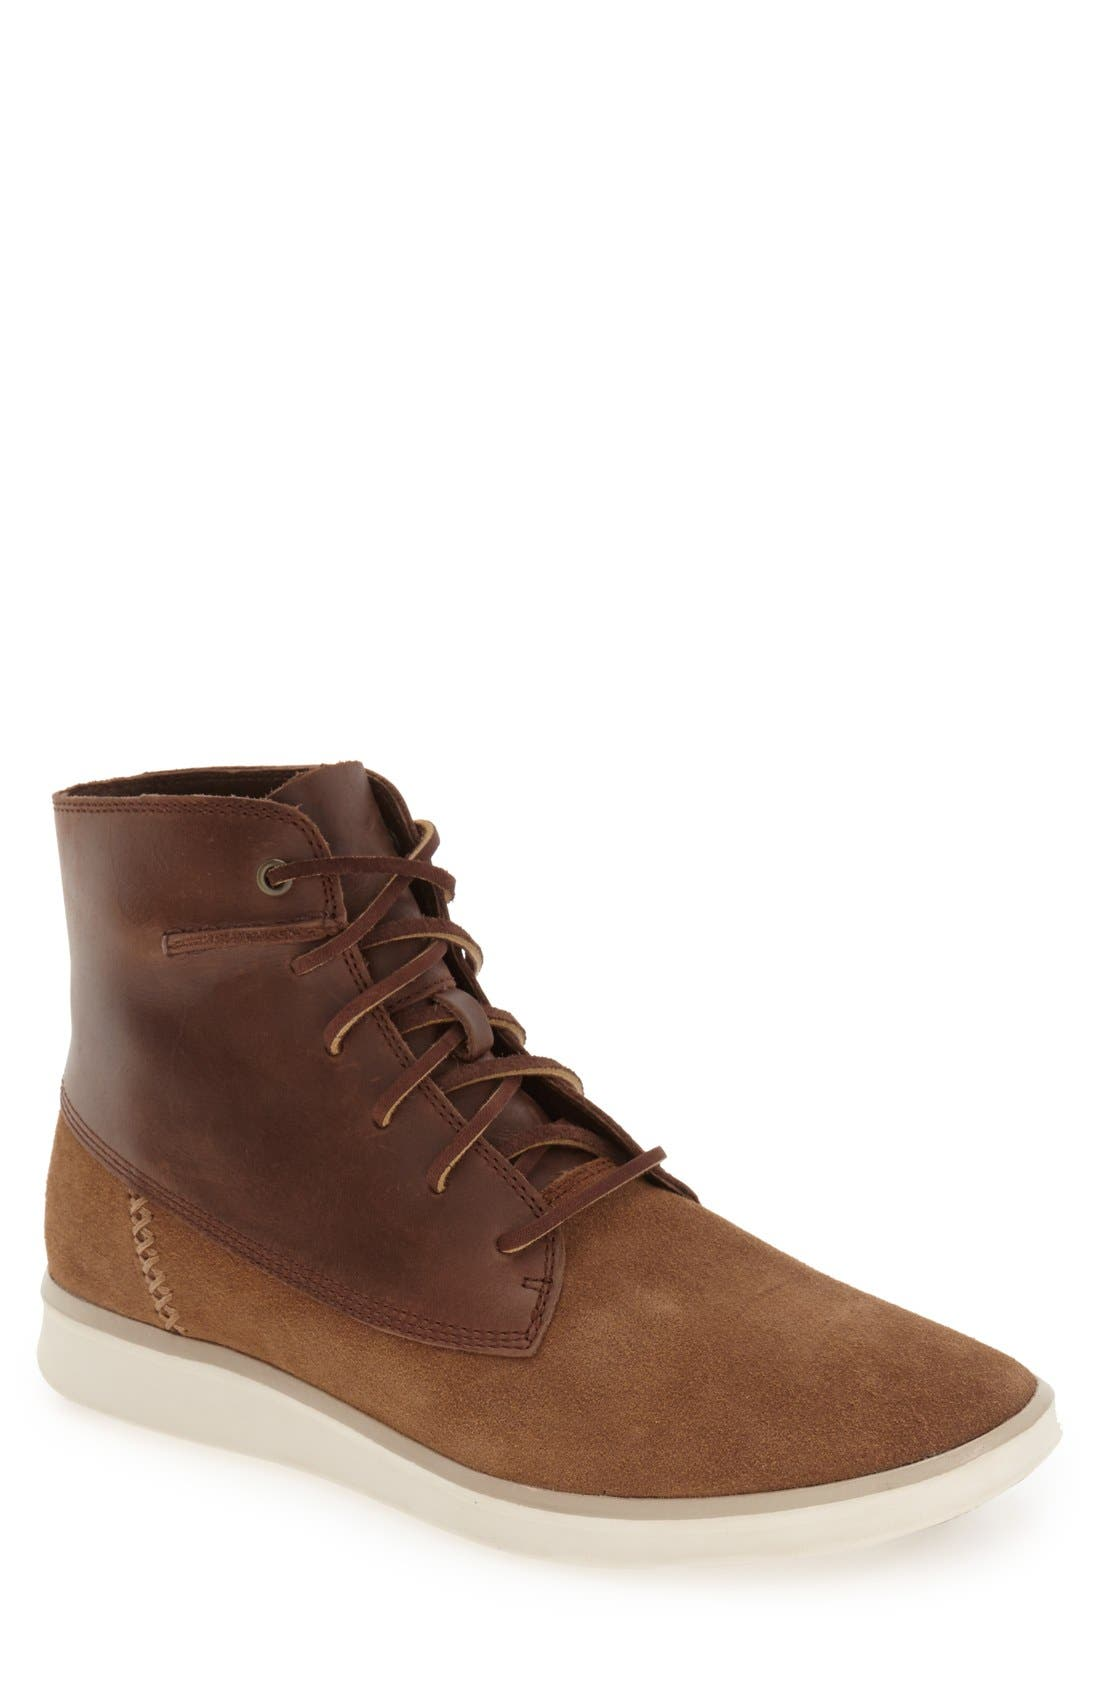 Main Image - UGG® 'Lamont' High Top Sneaker (Men)